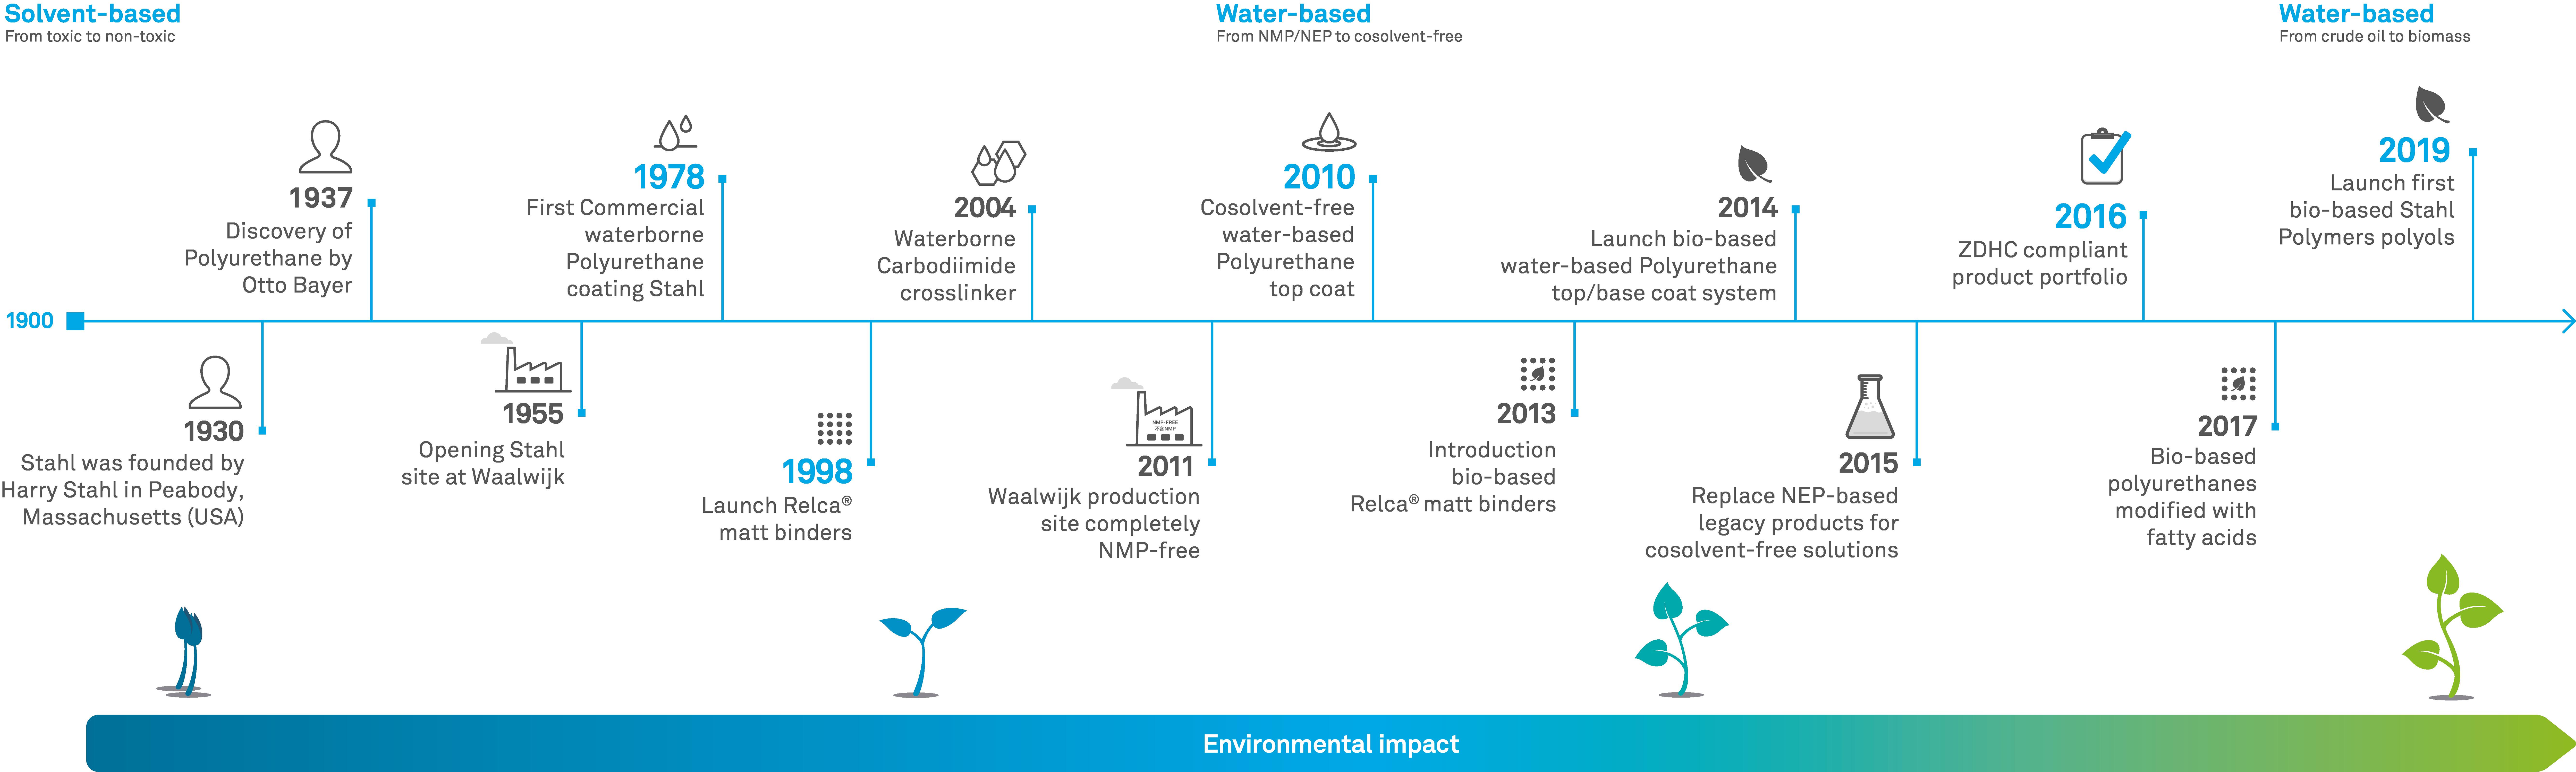 Stahl Polymers timeline